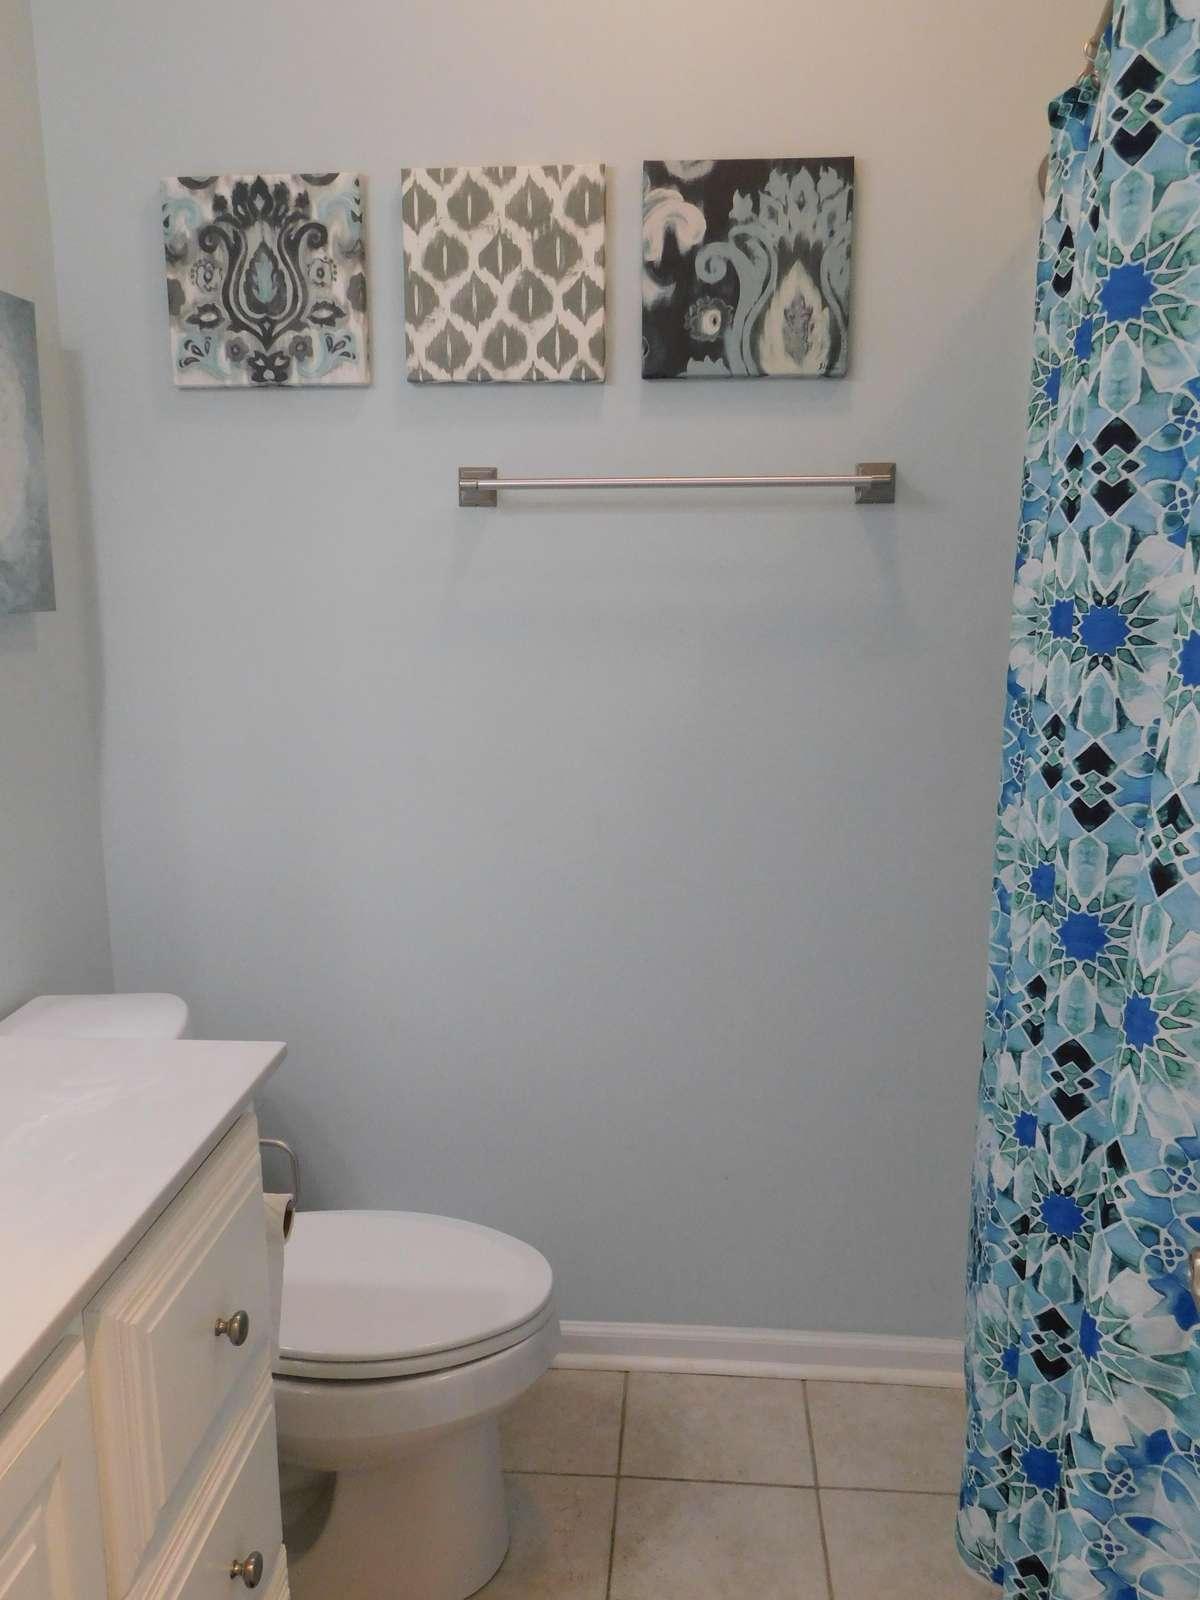 Hall Bath Tub/Shower combo